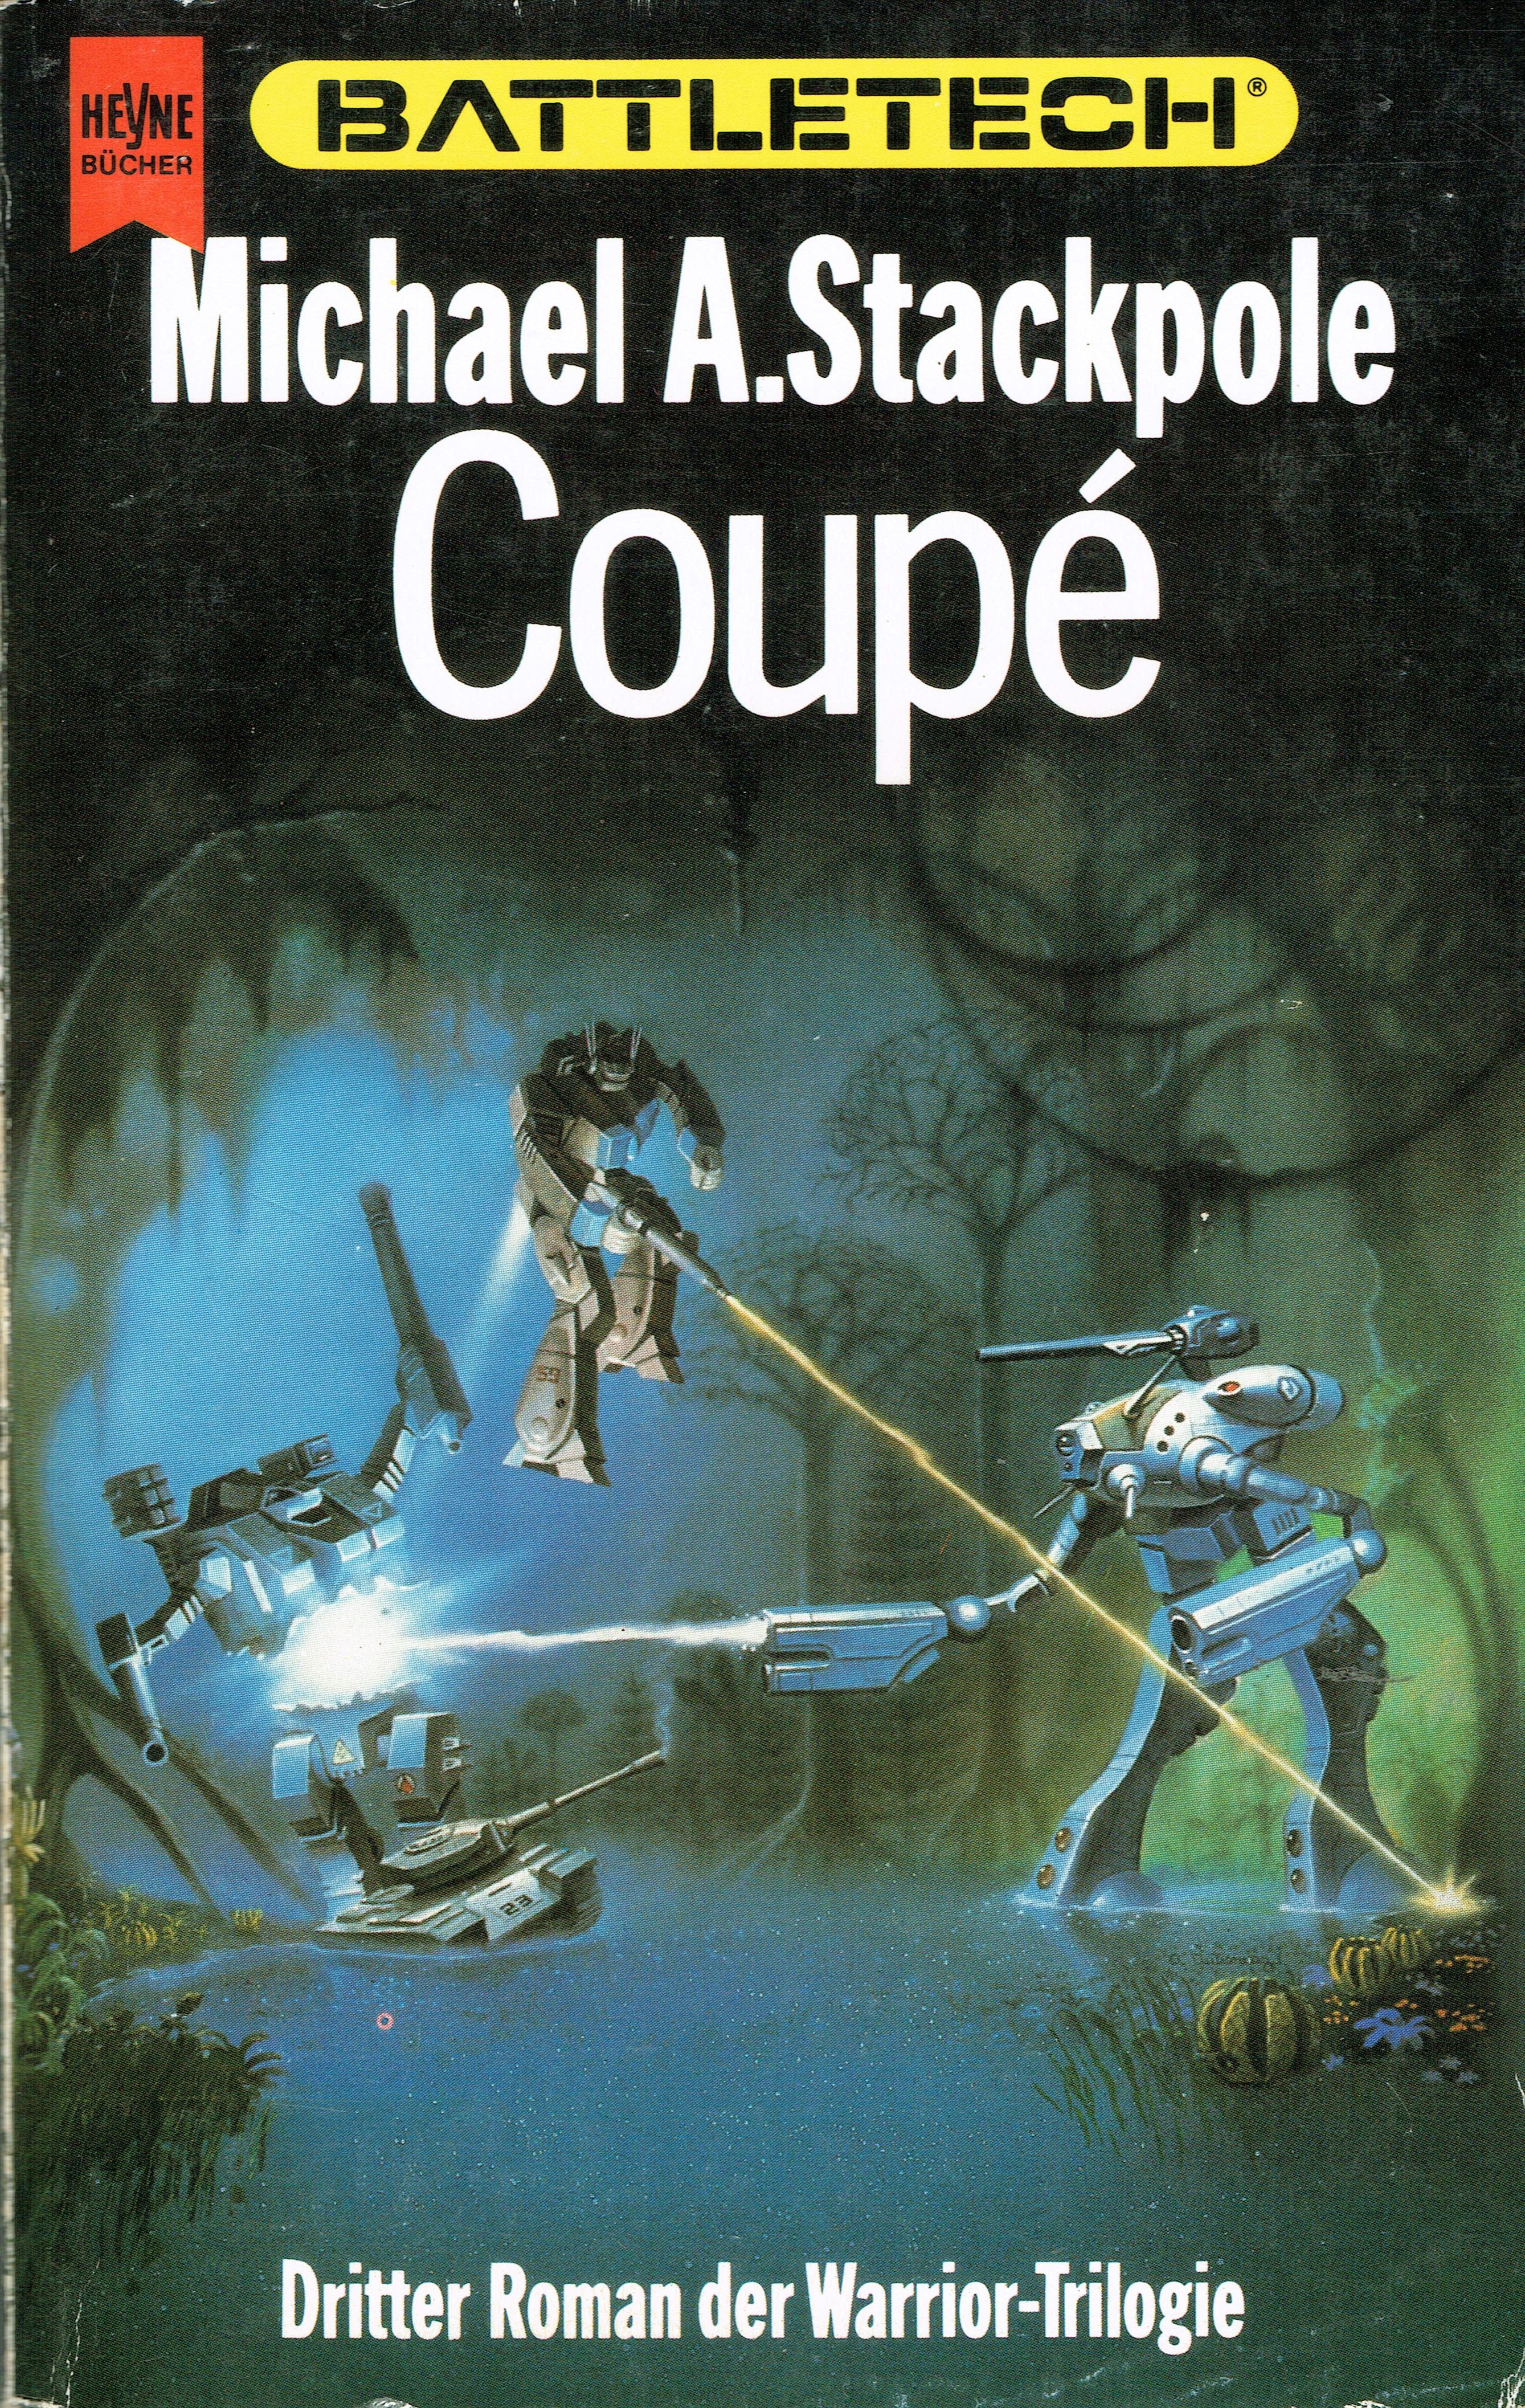 File:Coupé.jpg